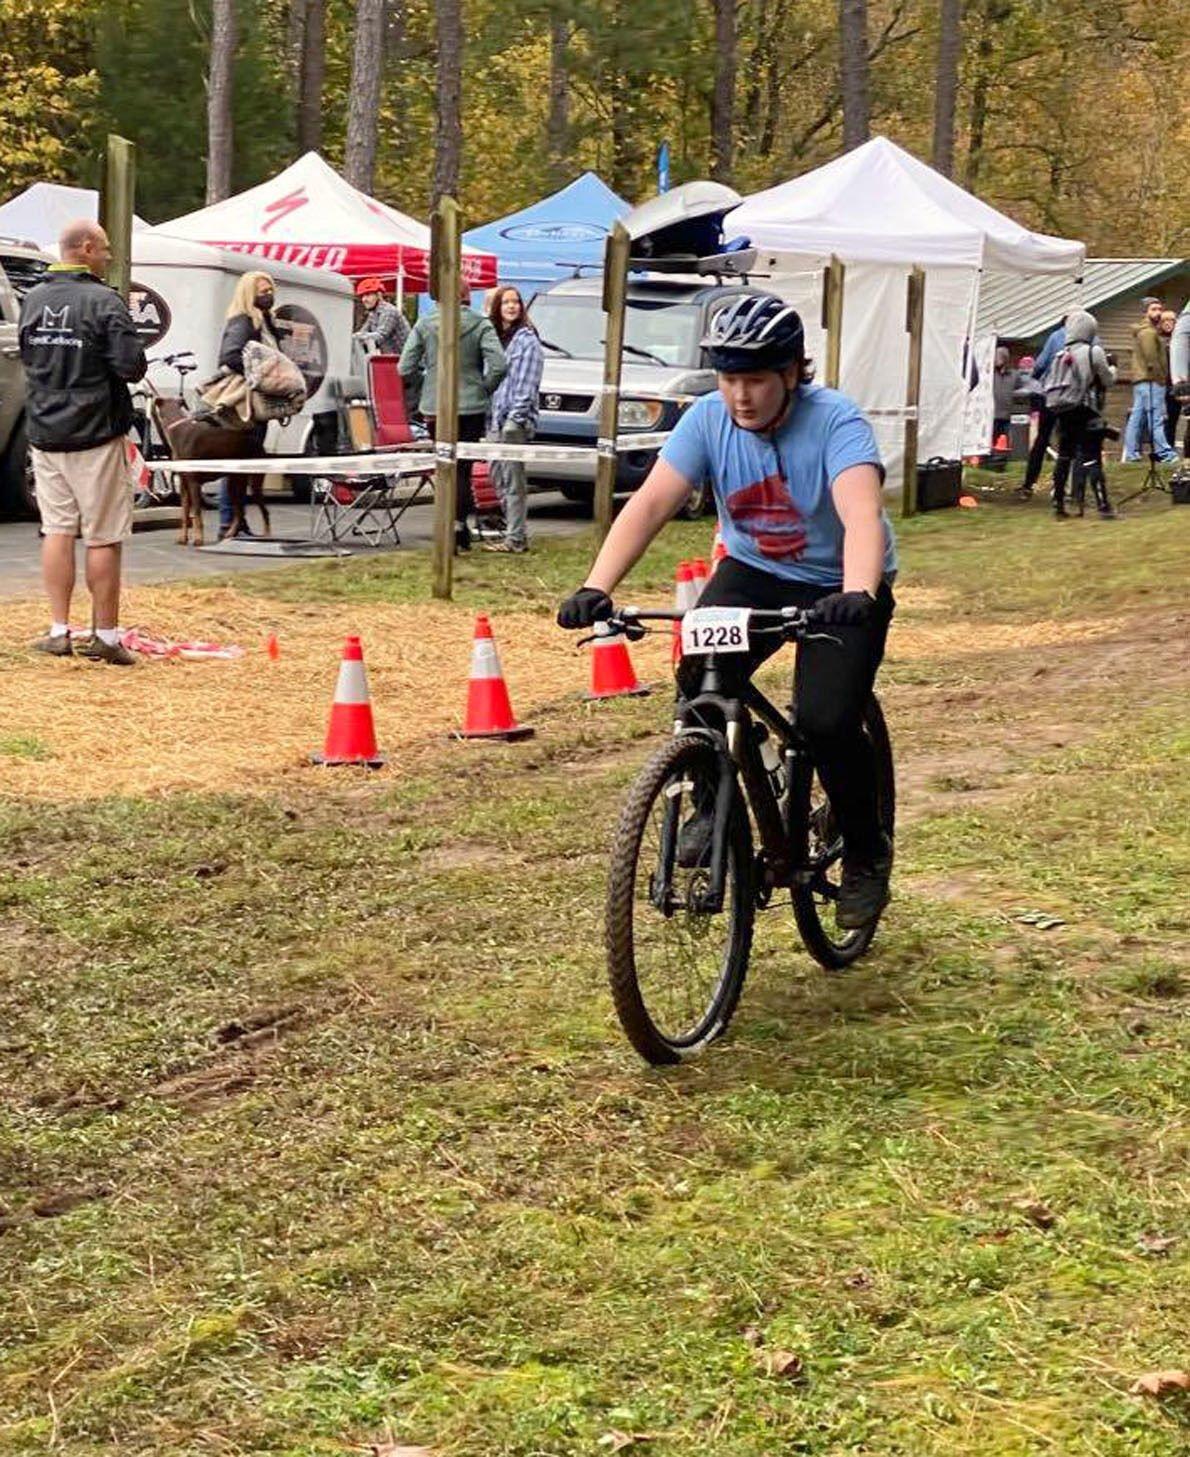 Youth mountain biking rolls into area